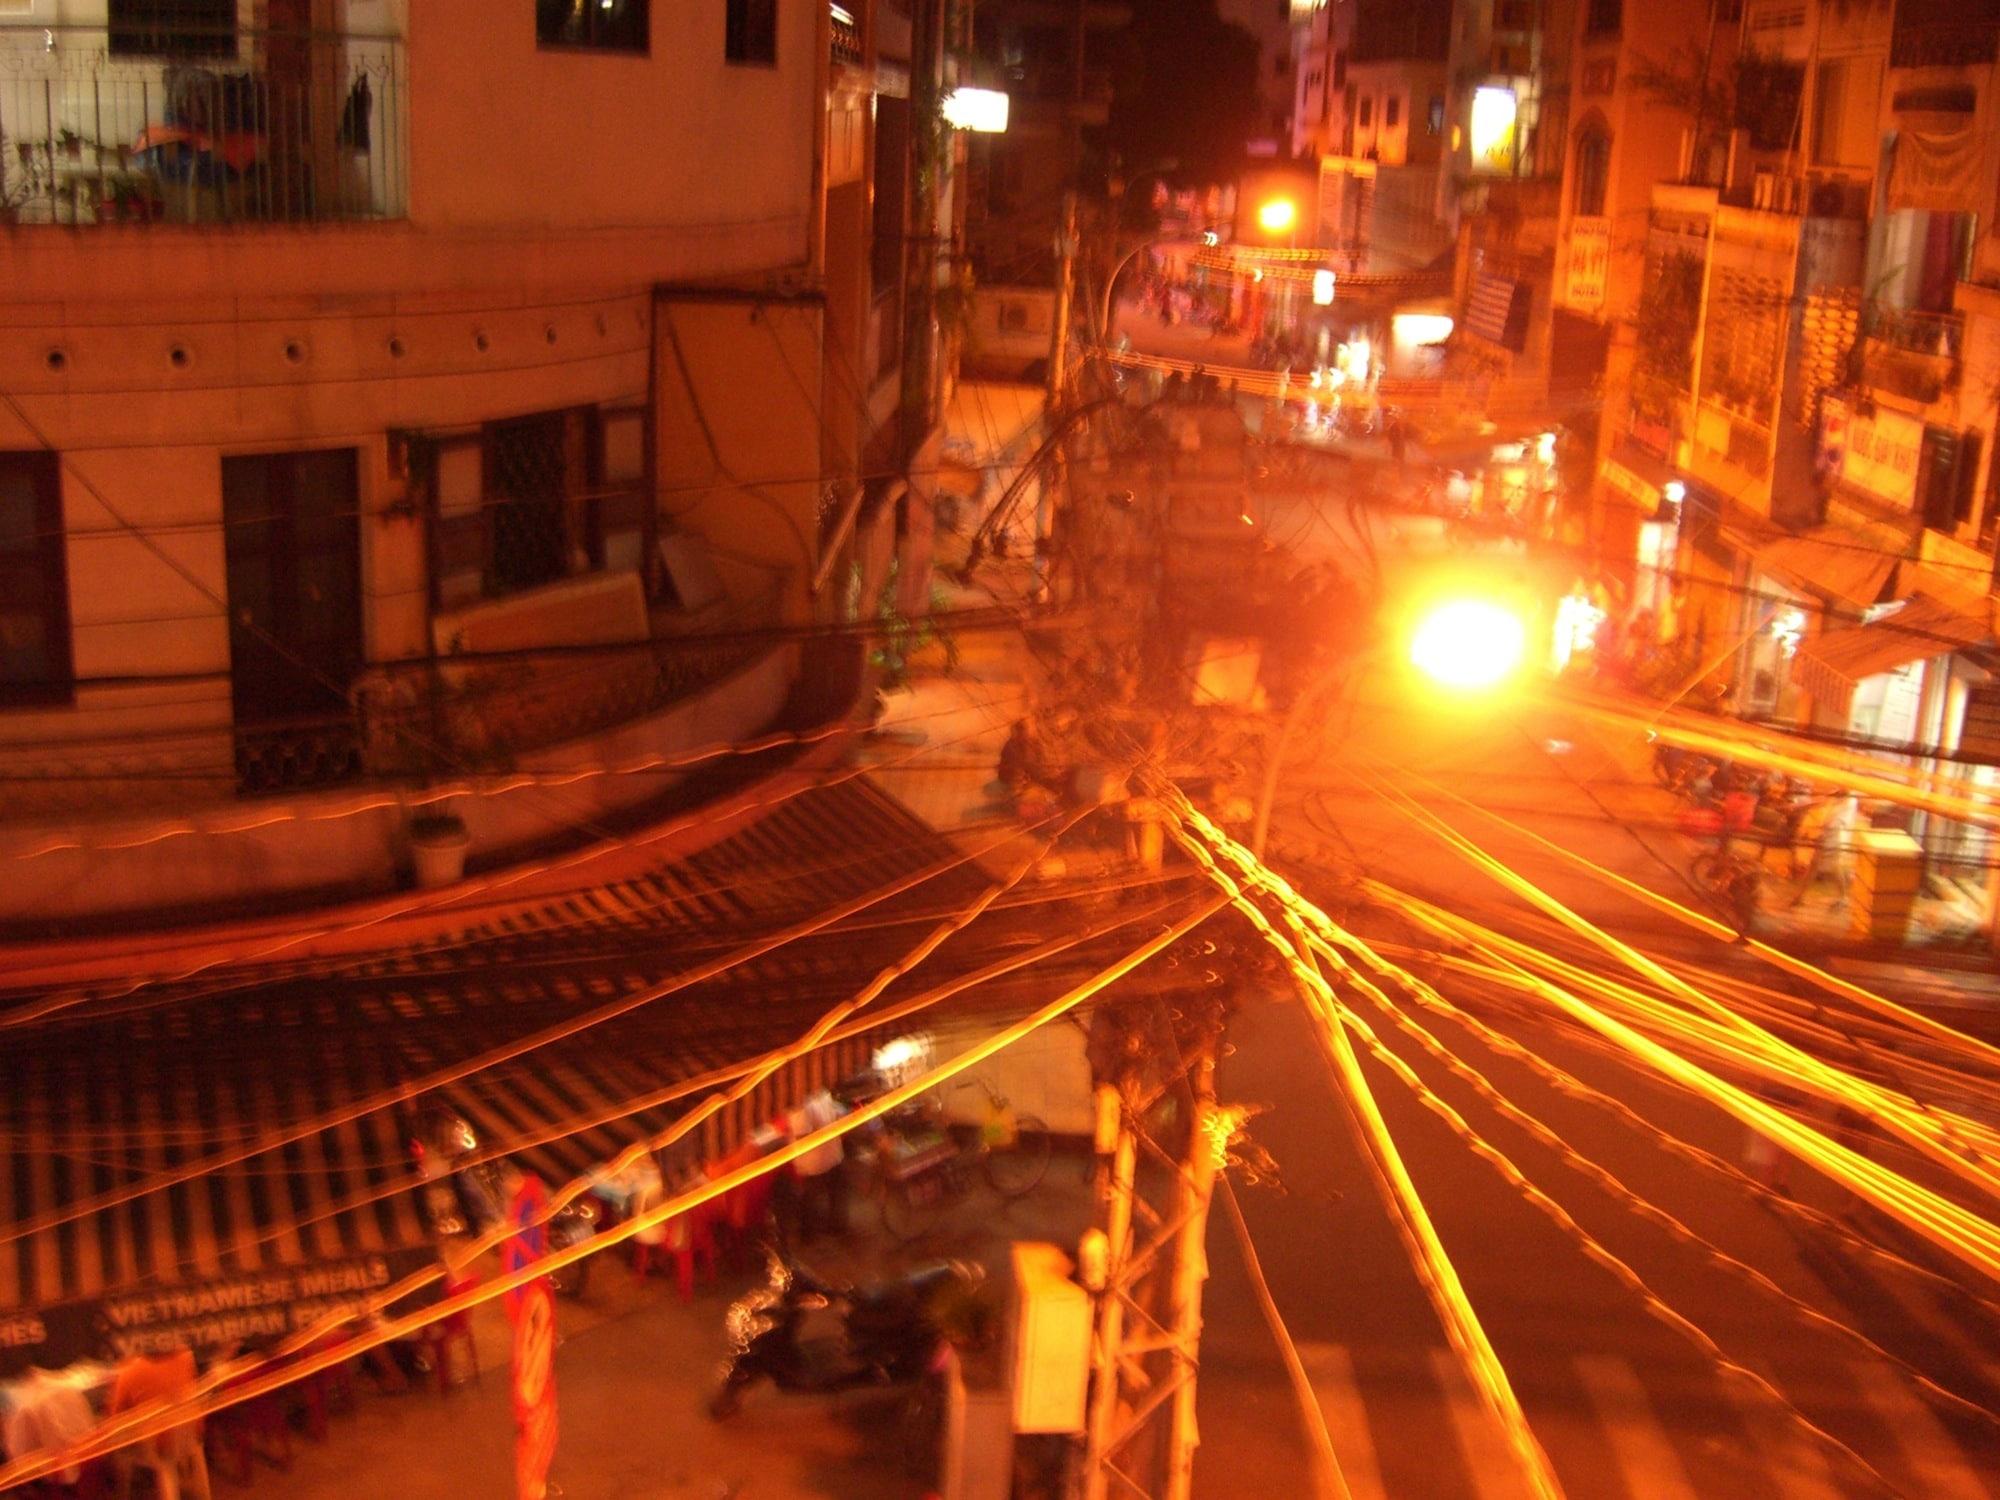 Blick aus dem Hotel in Bui Vien, Saigon